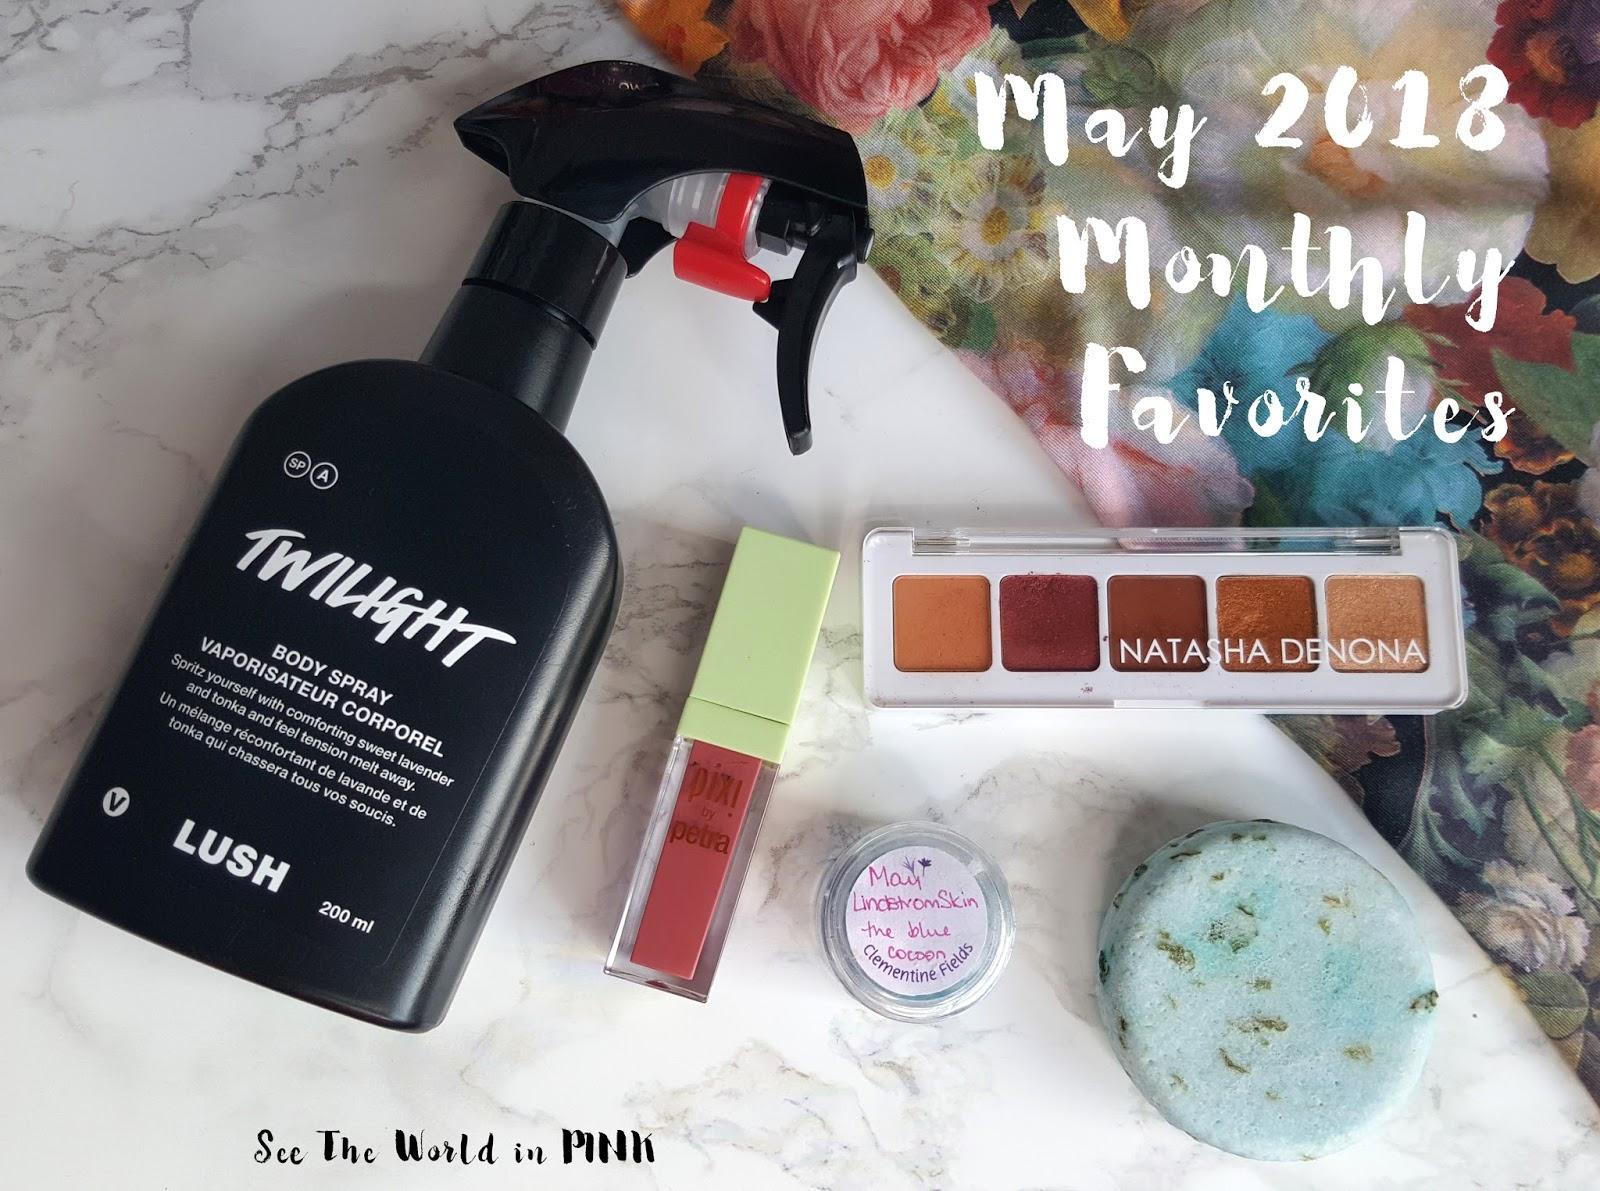 April 2018 - Monthly Favorites!